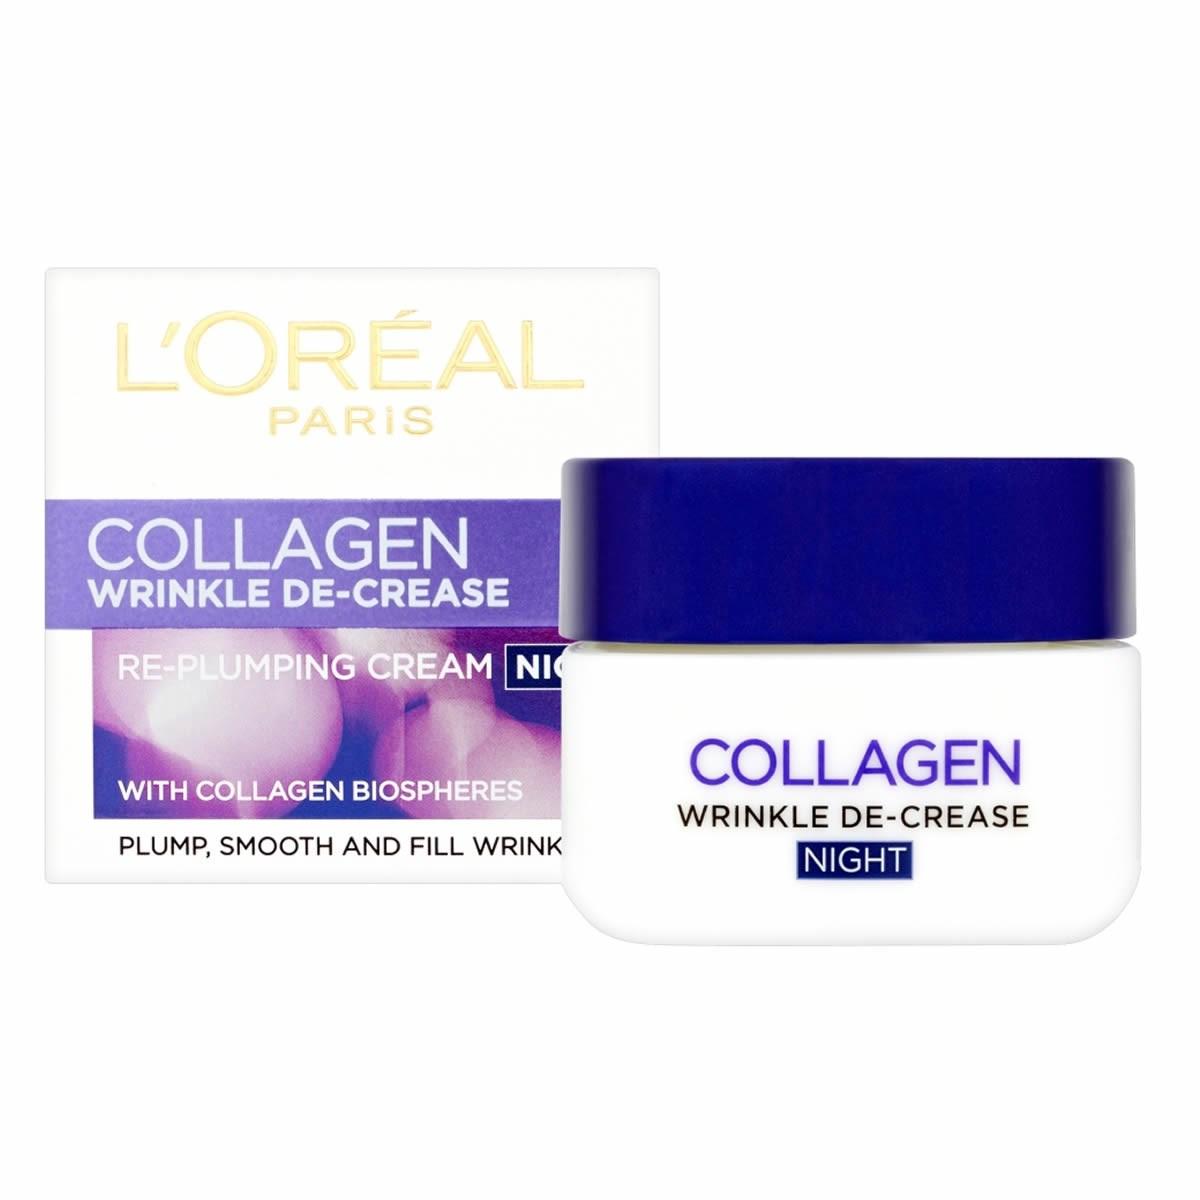 L'Oreal Paris Wrinkle De-Crease Collagen Re-Plumping  Night Cream